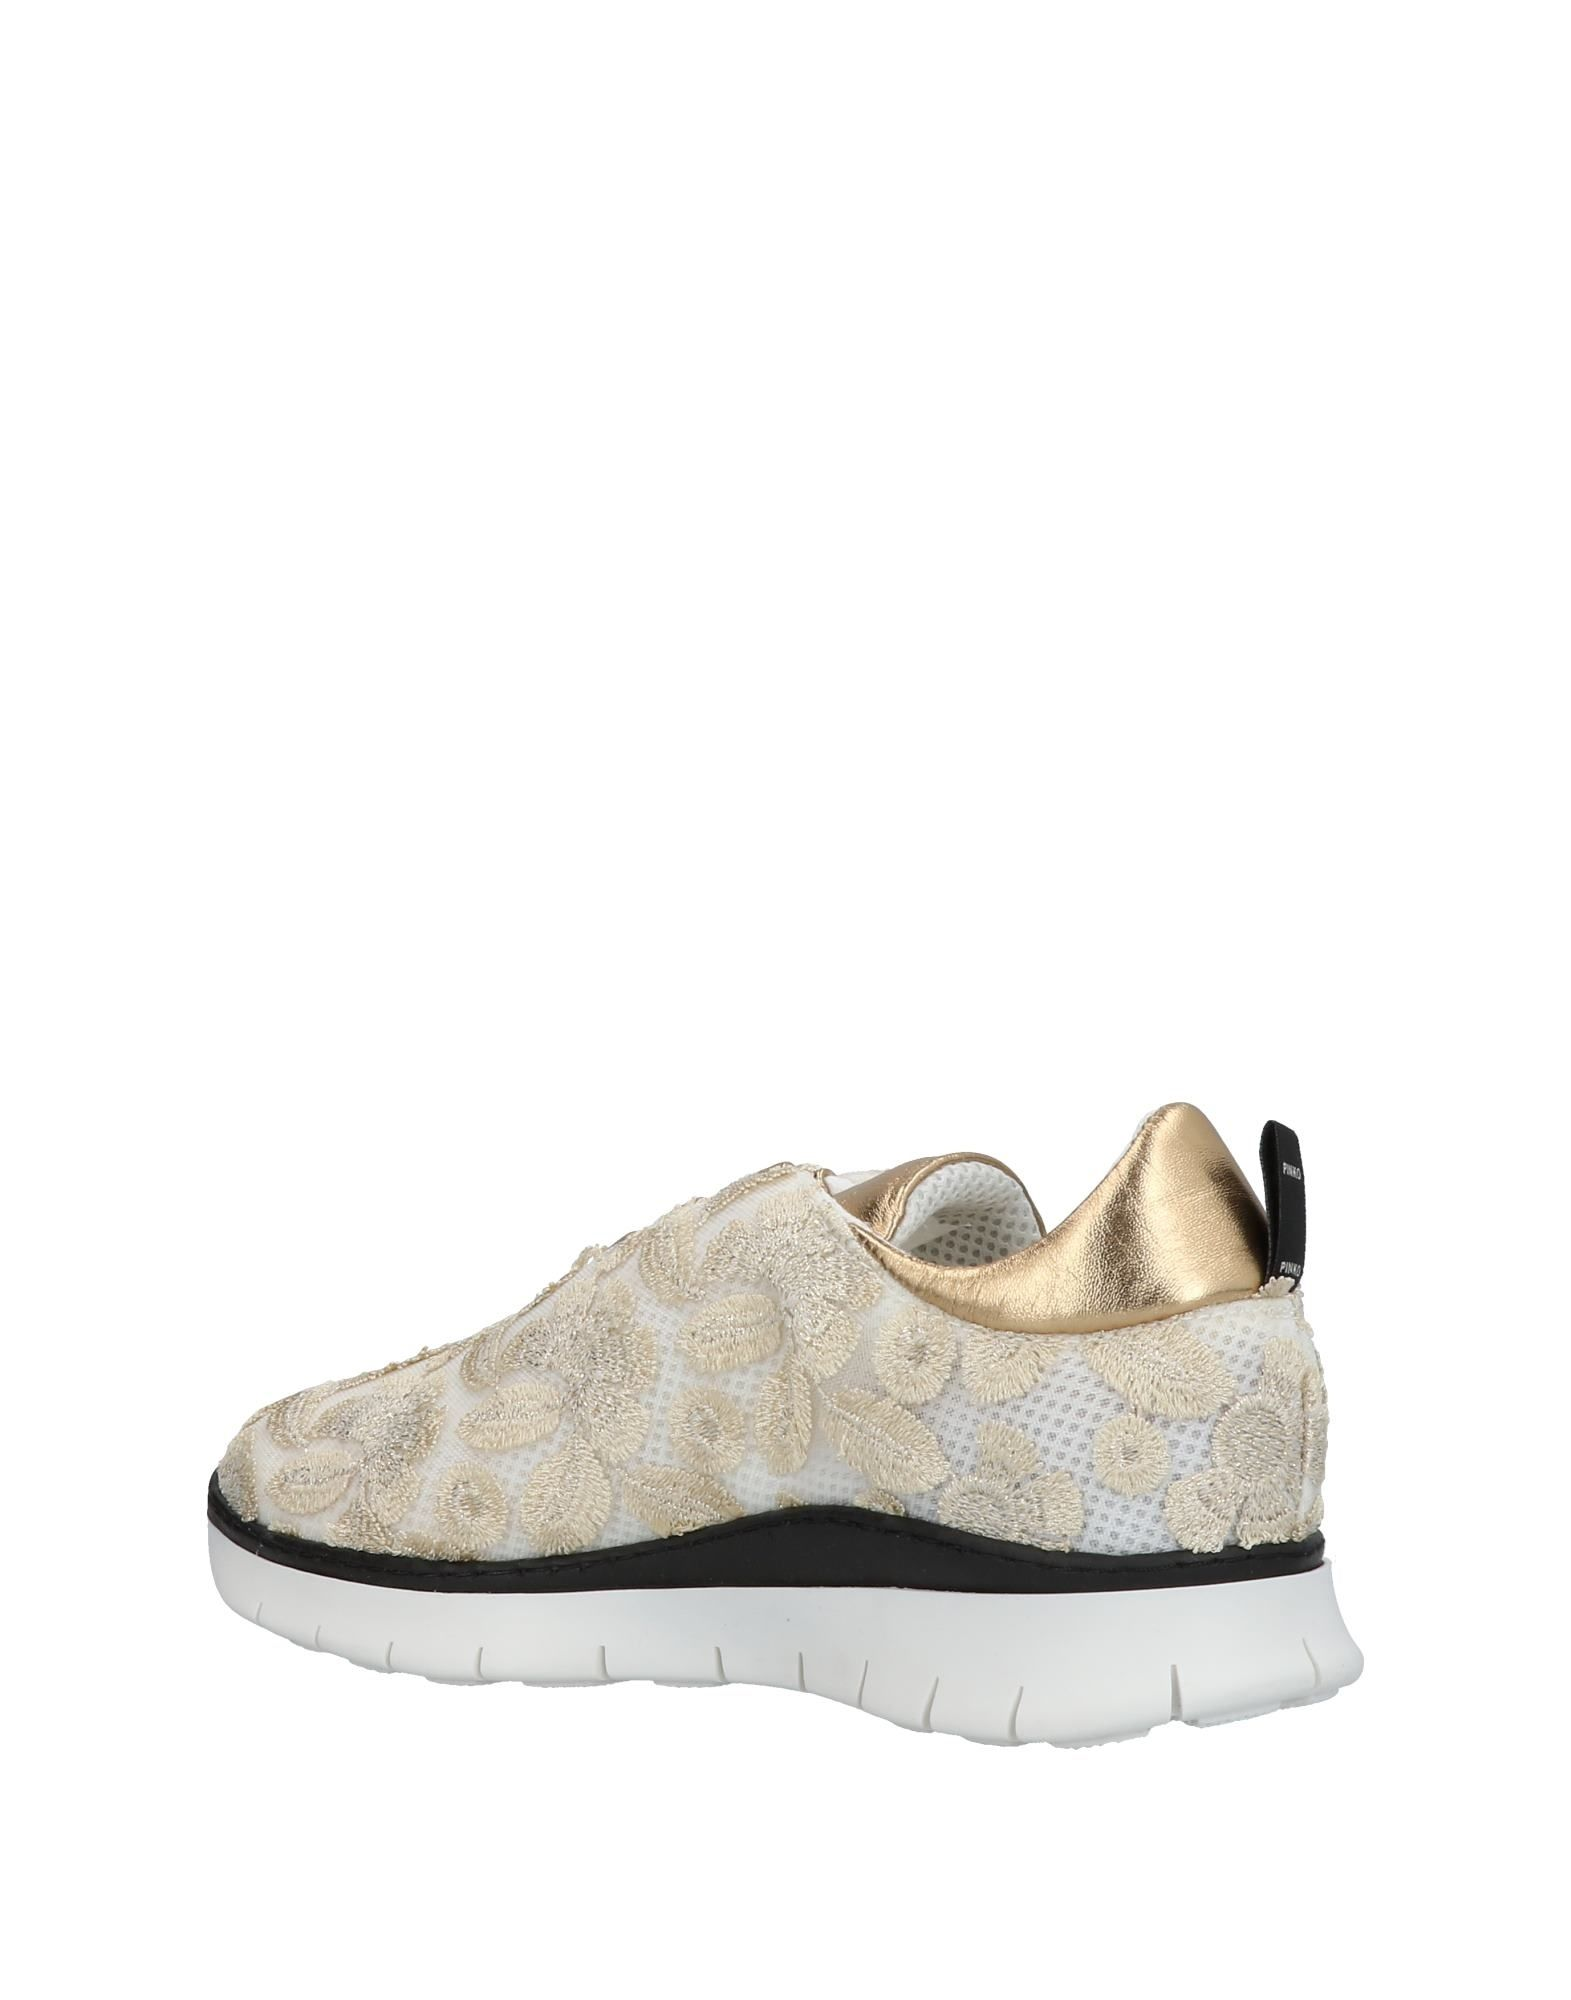 Pinko Sneakers Damen  11433678MO Qualität Gute Qualität 11433678MO beliebte Schuhe 4f49f0